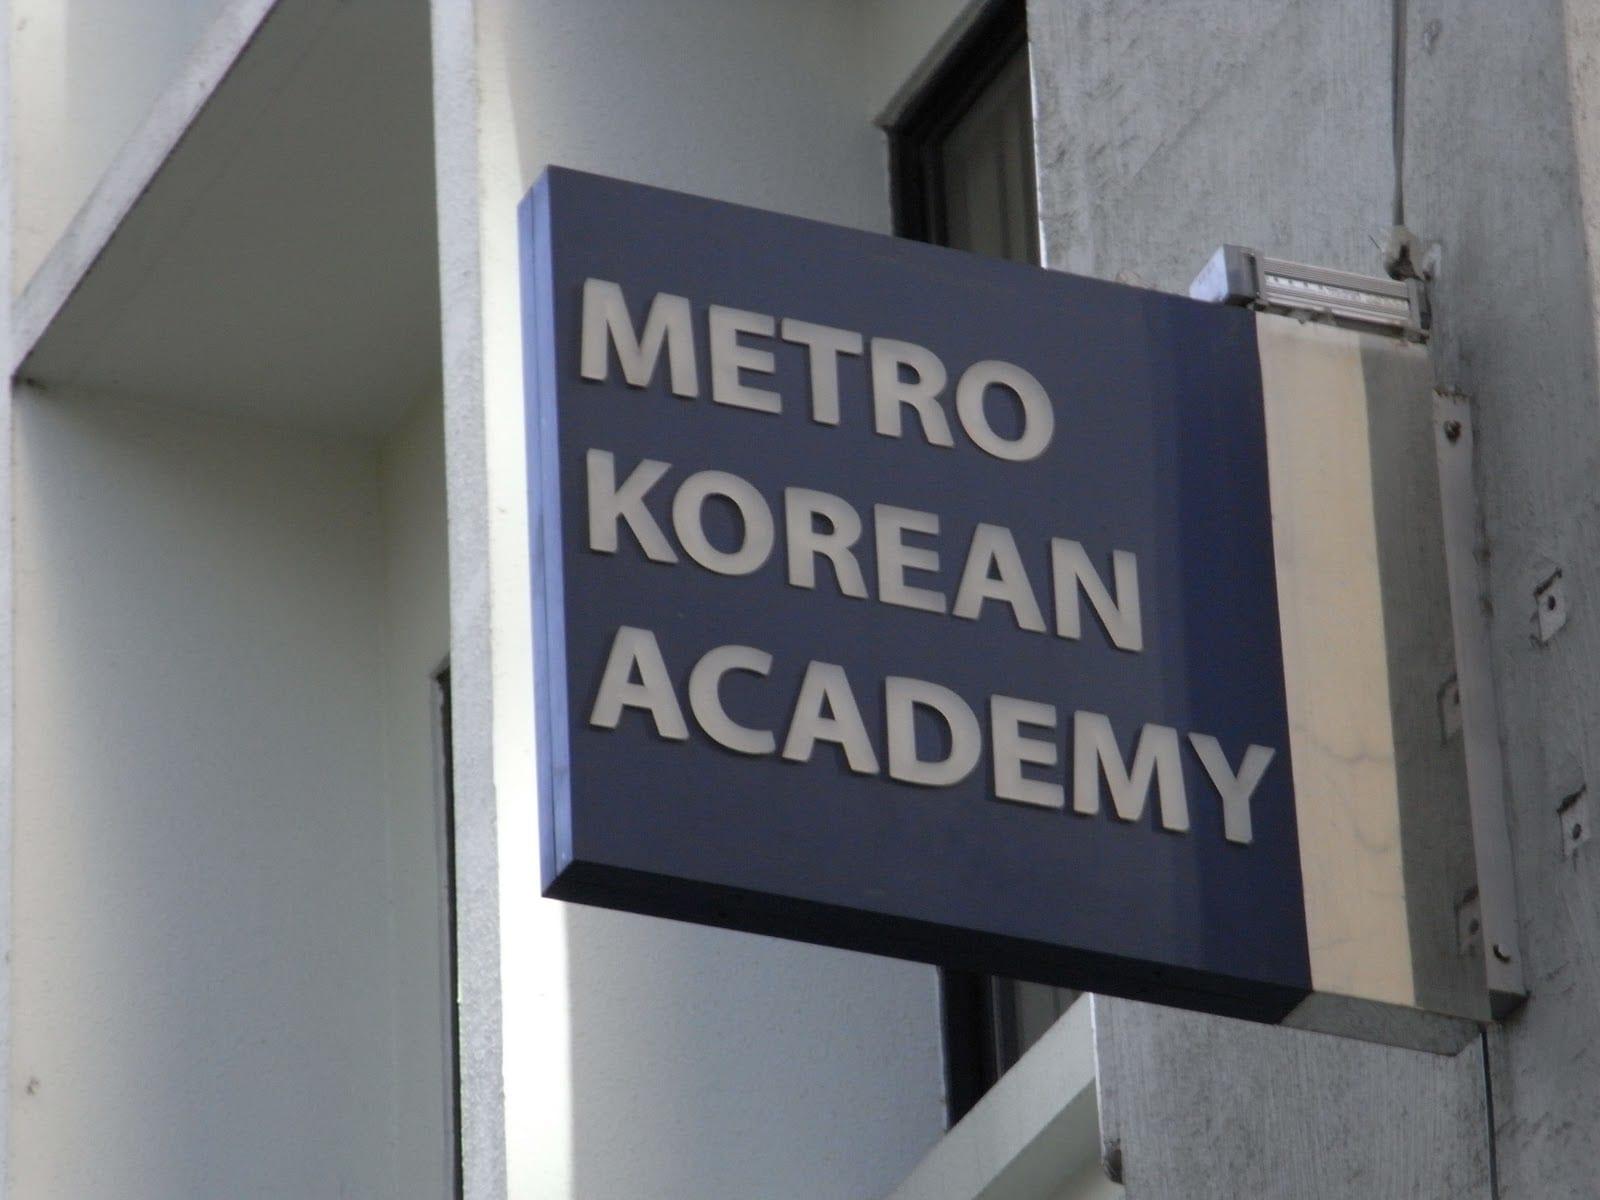 Metro Korean Academy | Jung-gu, Seoul